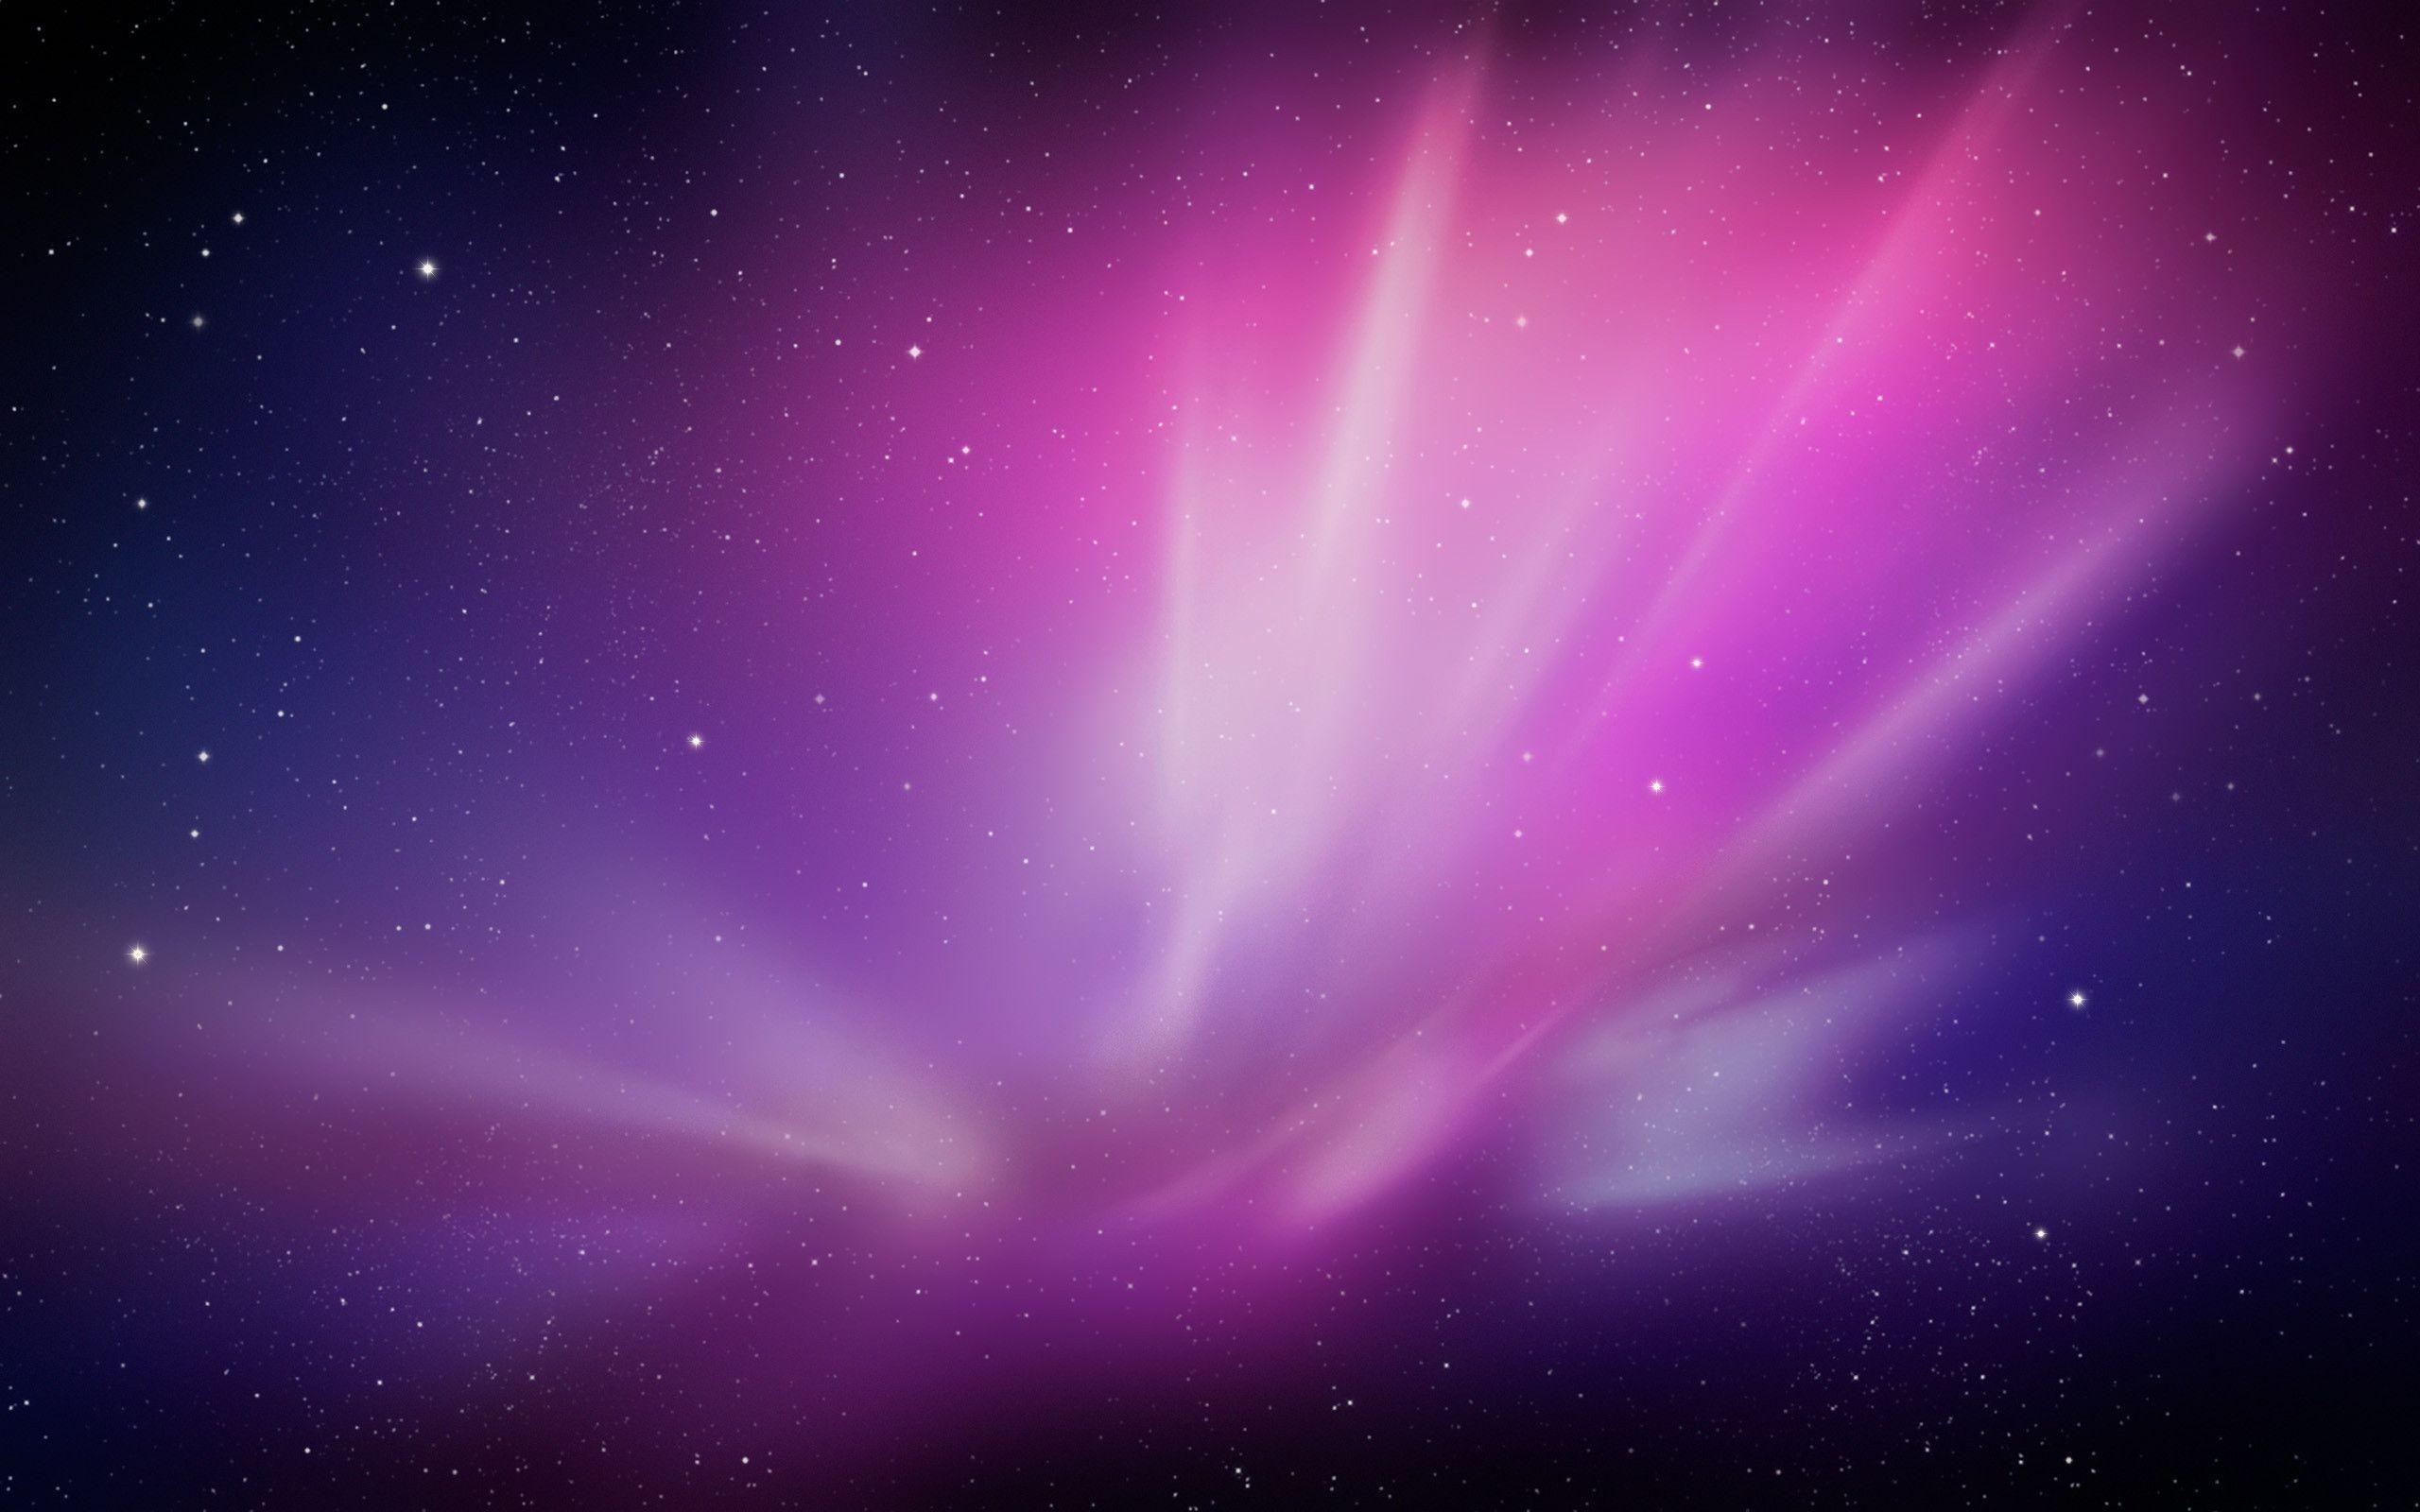 Galaxy Wallpapers – Full HD wallpaper search